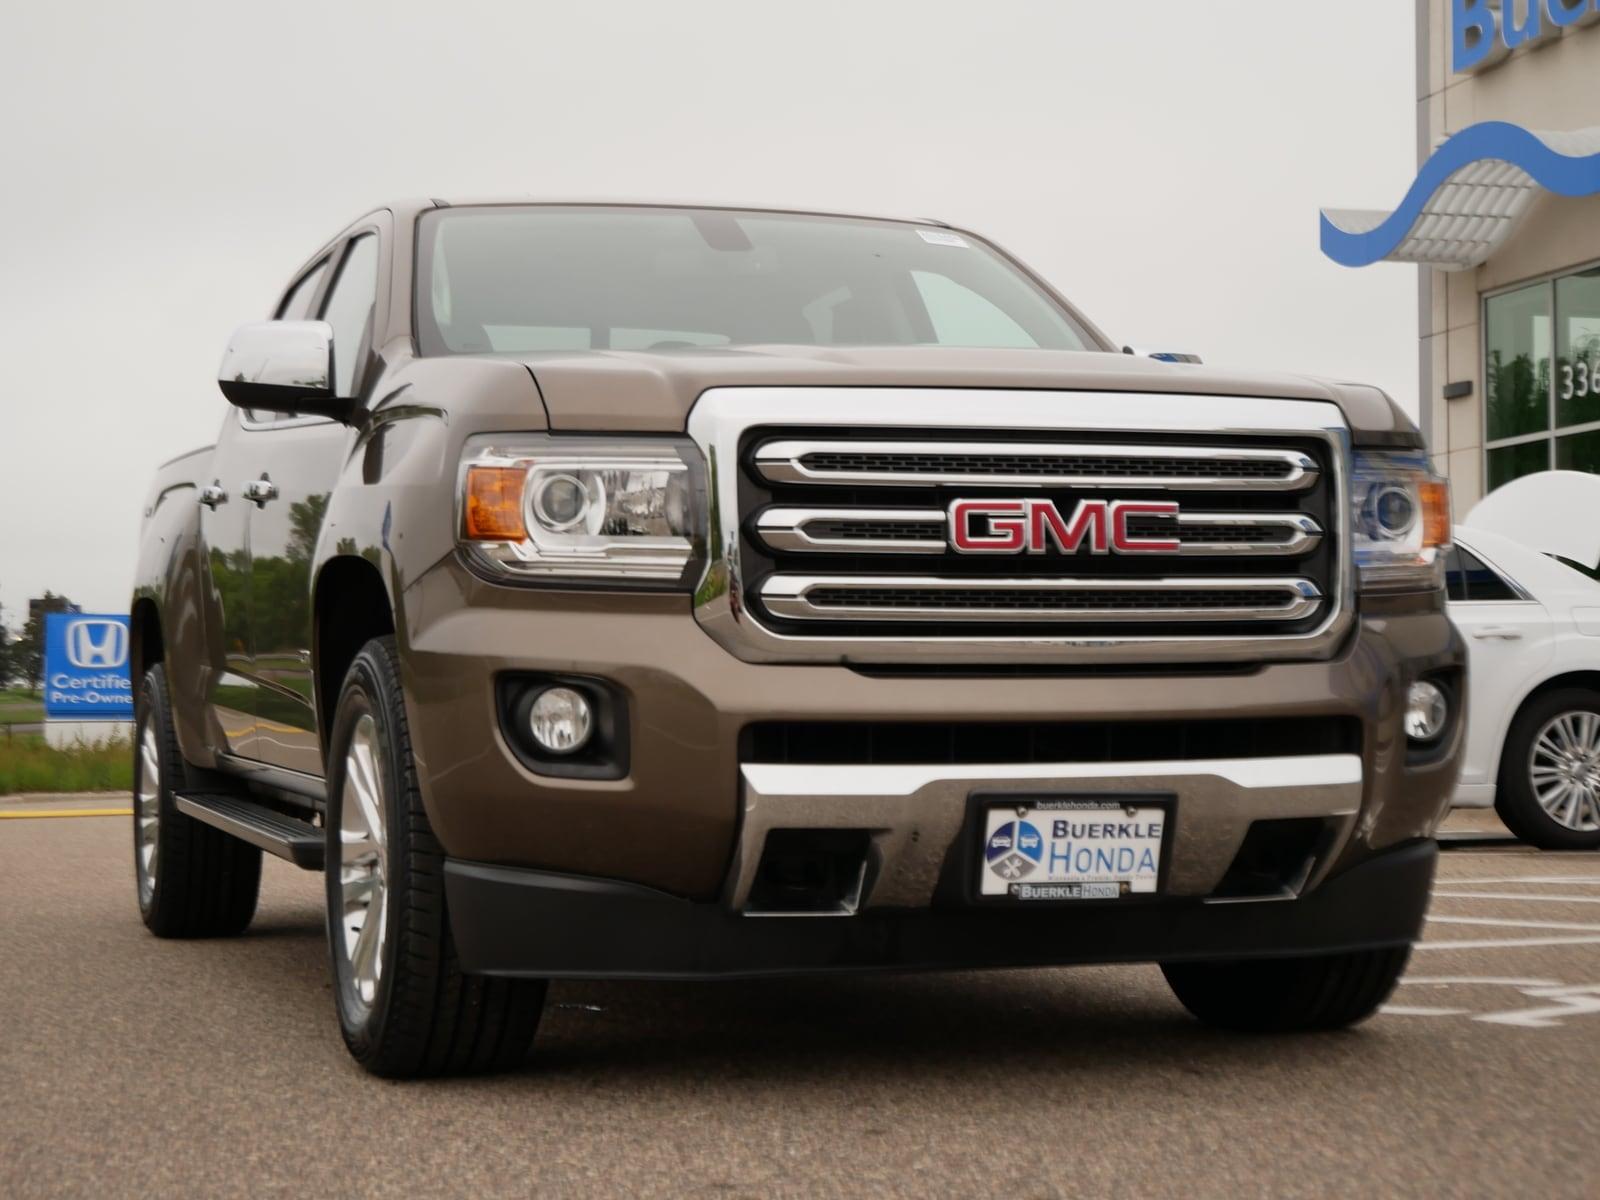 Used 2016 GMC Canyon SLT with VIN 1GTG6DE31G1314591 for sale in Saint Paul, Minnesota